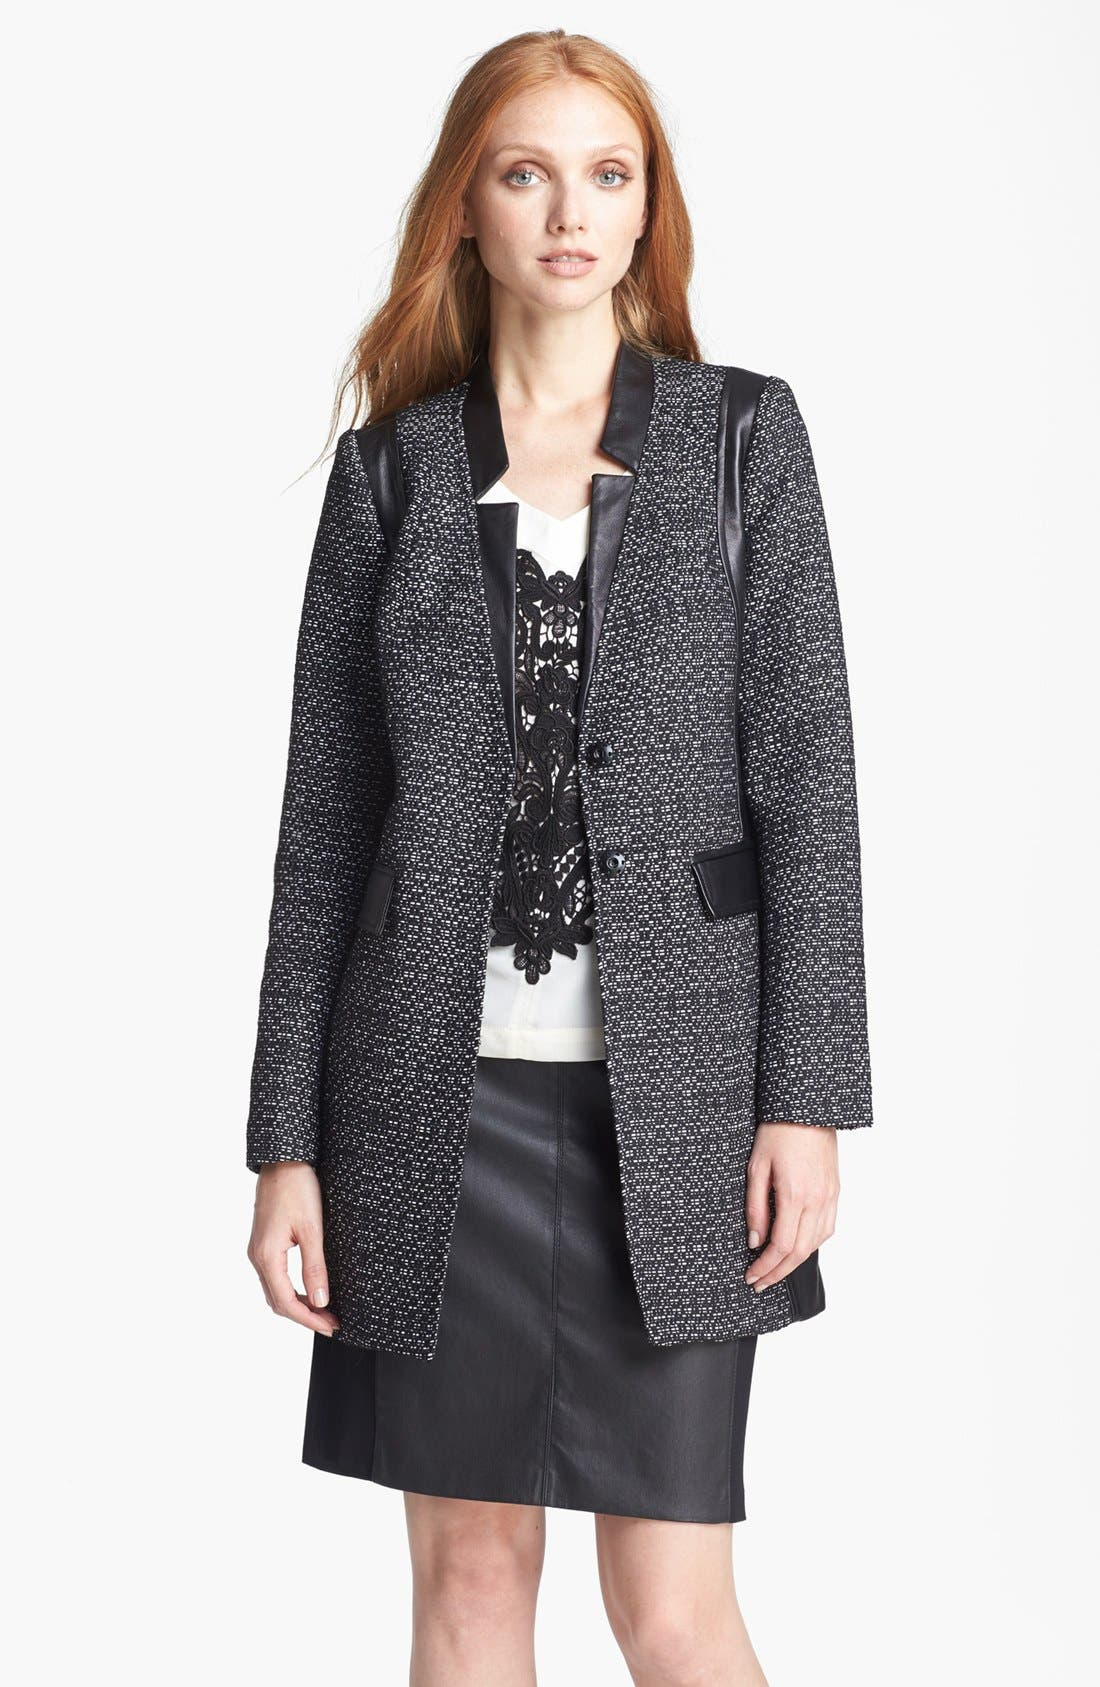 Main Image - Nanette Lepore 'Big Top' Tweed & Leather Coat